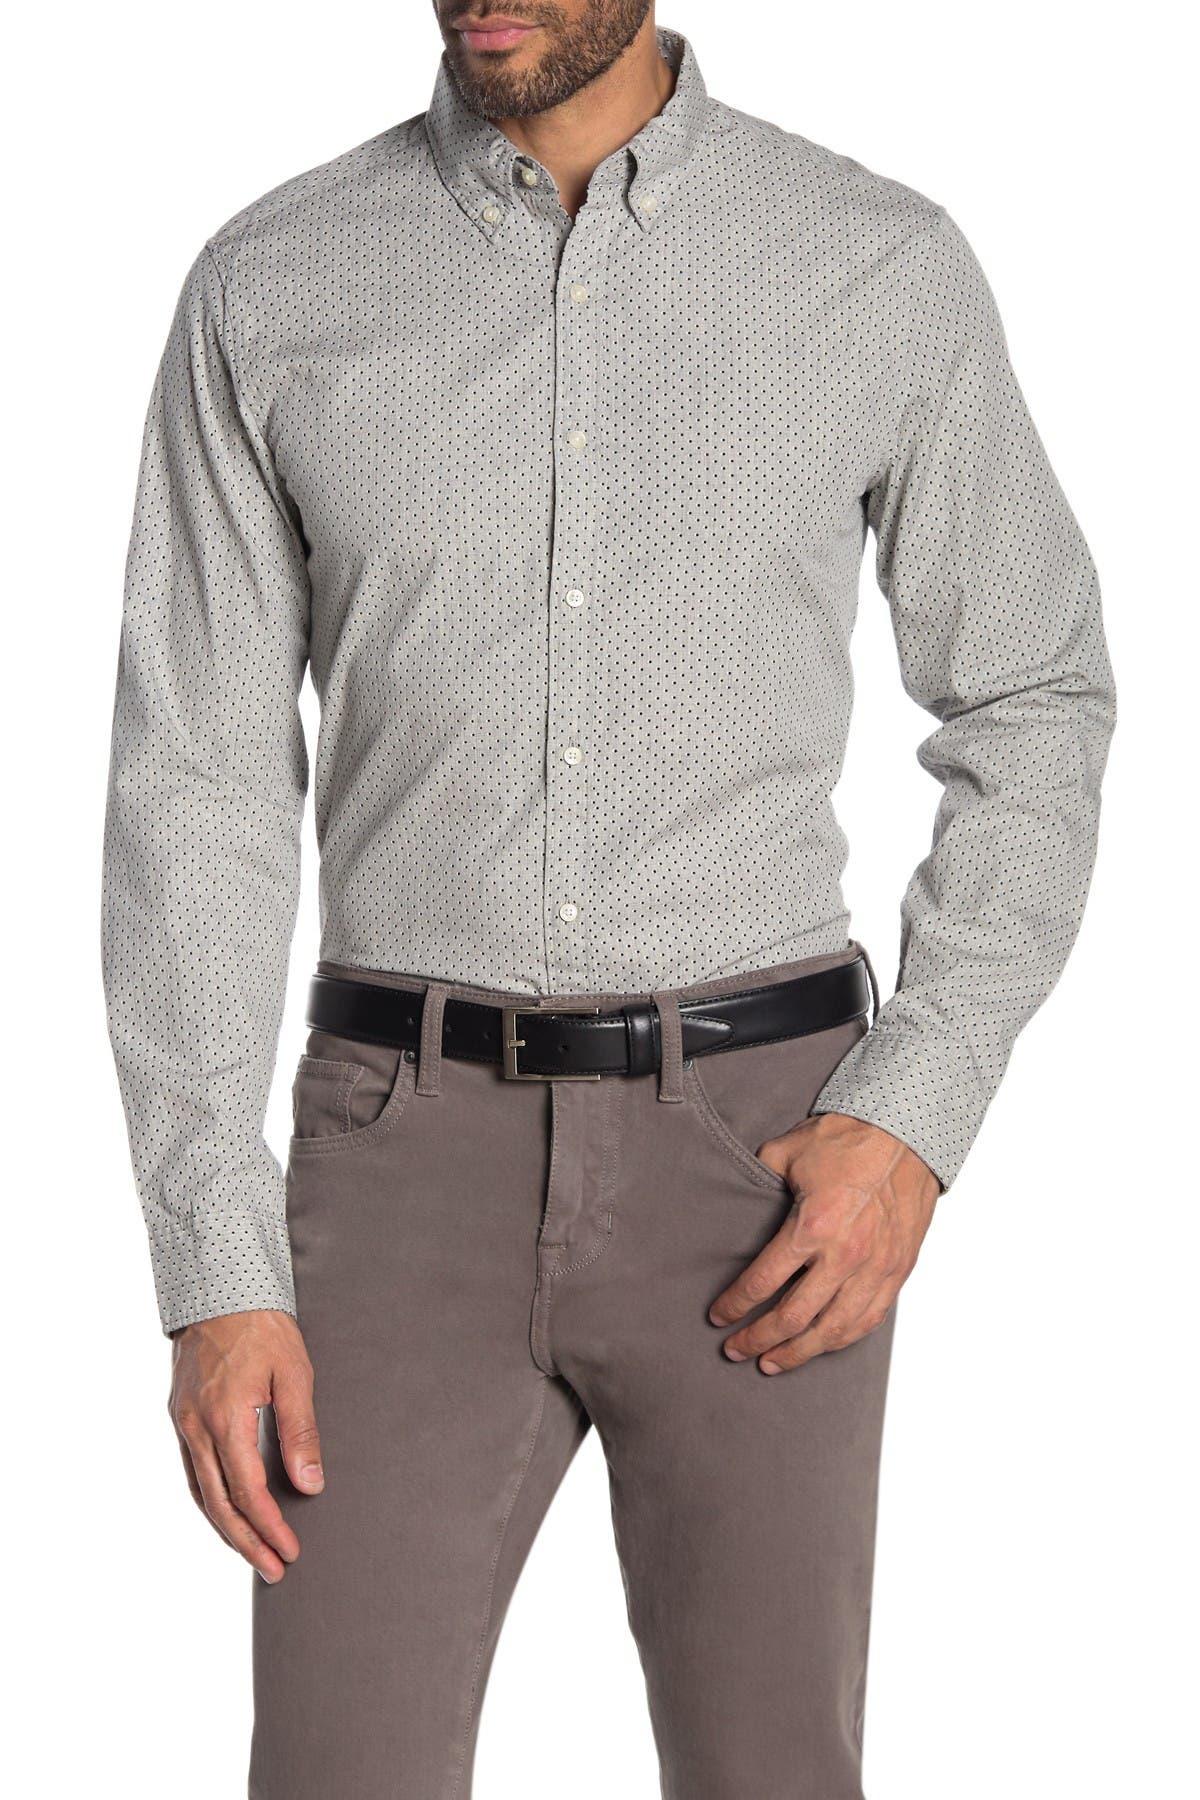 Image of Michael Kors Dot Print Slim Fit Shirt